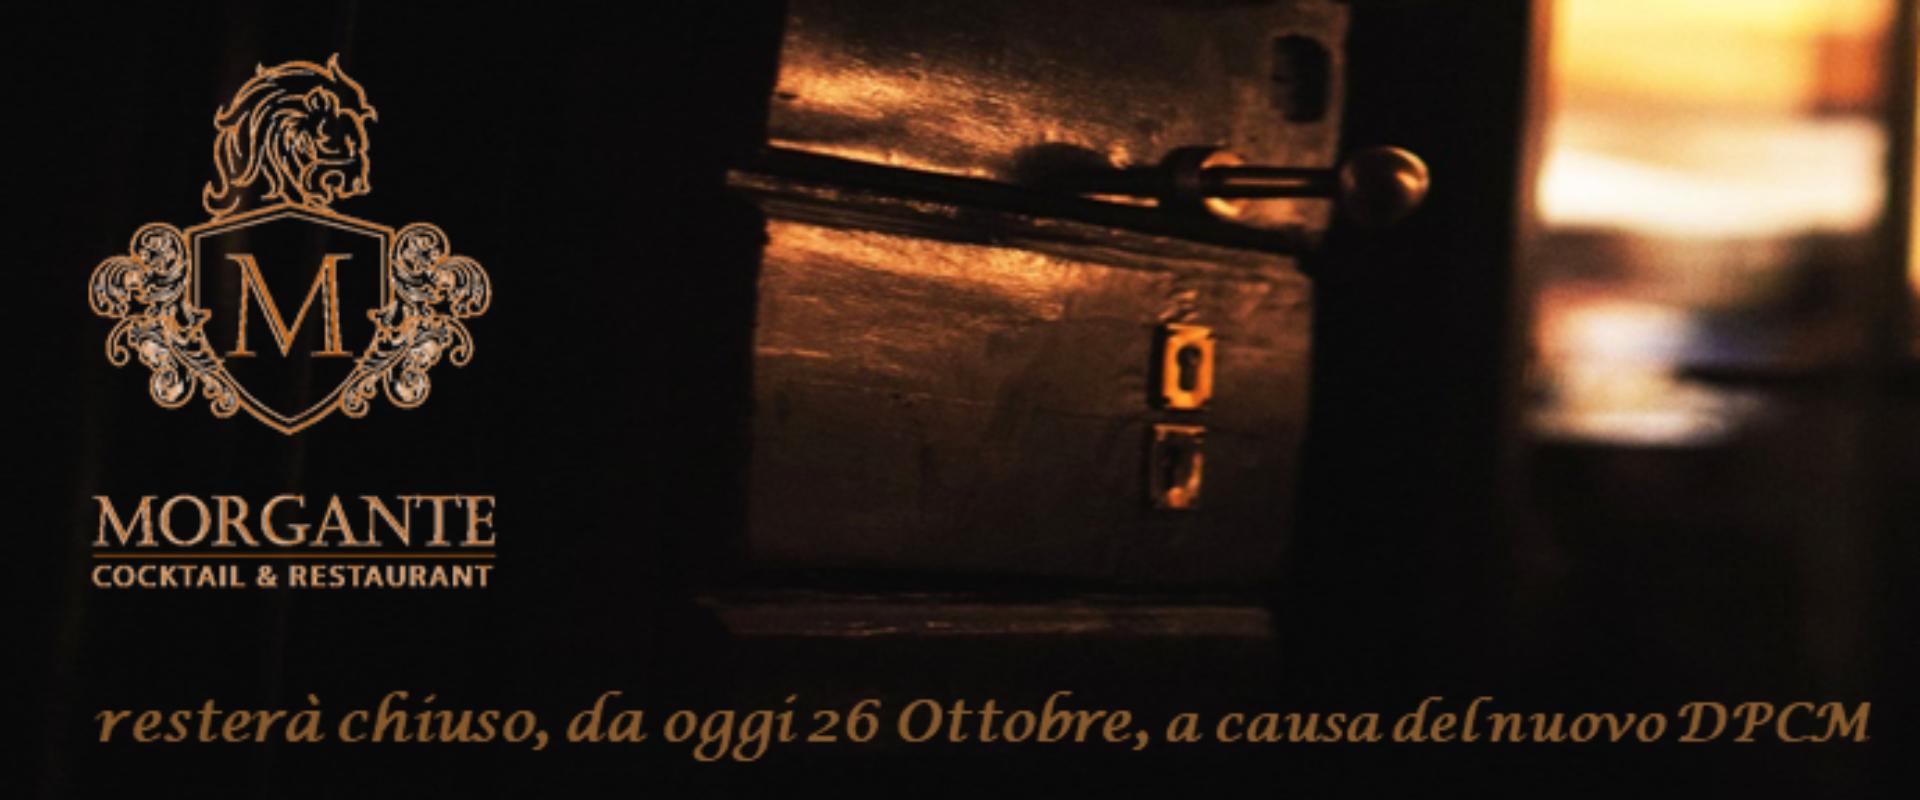 cropped-DPCM-2020.10.24.png